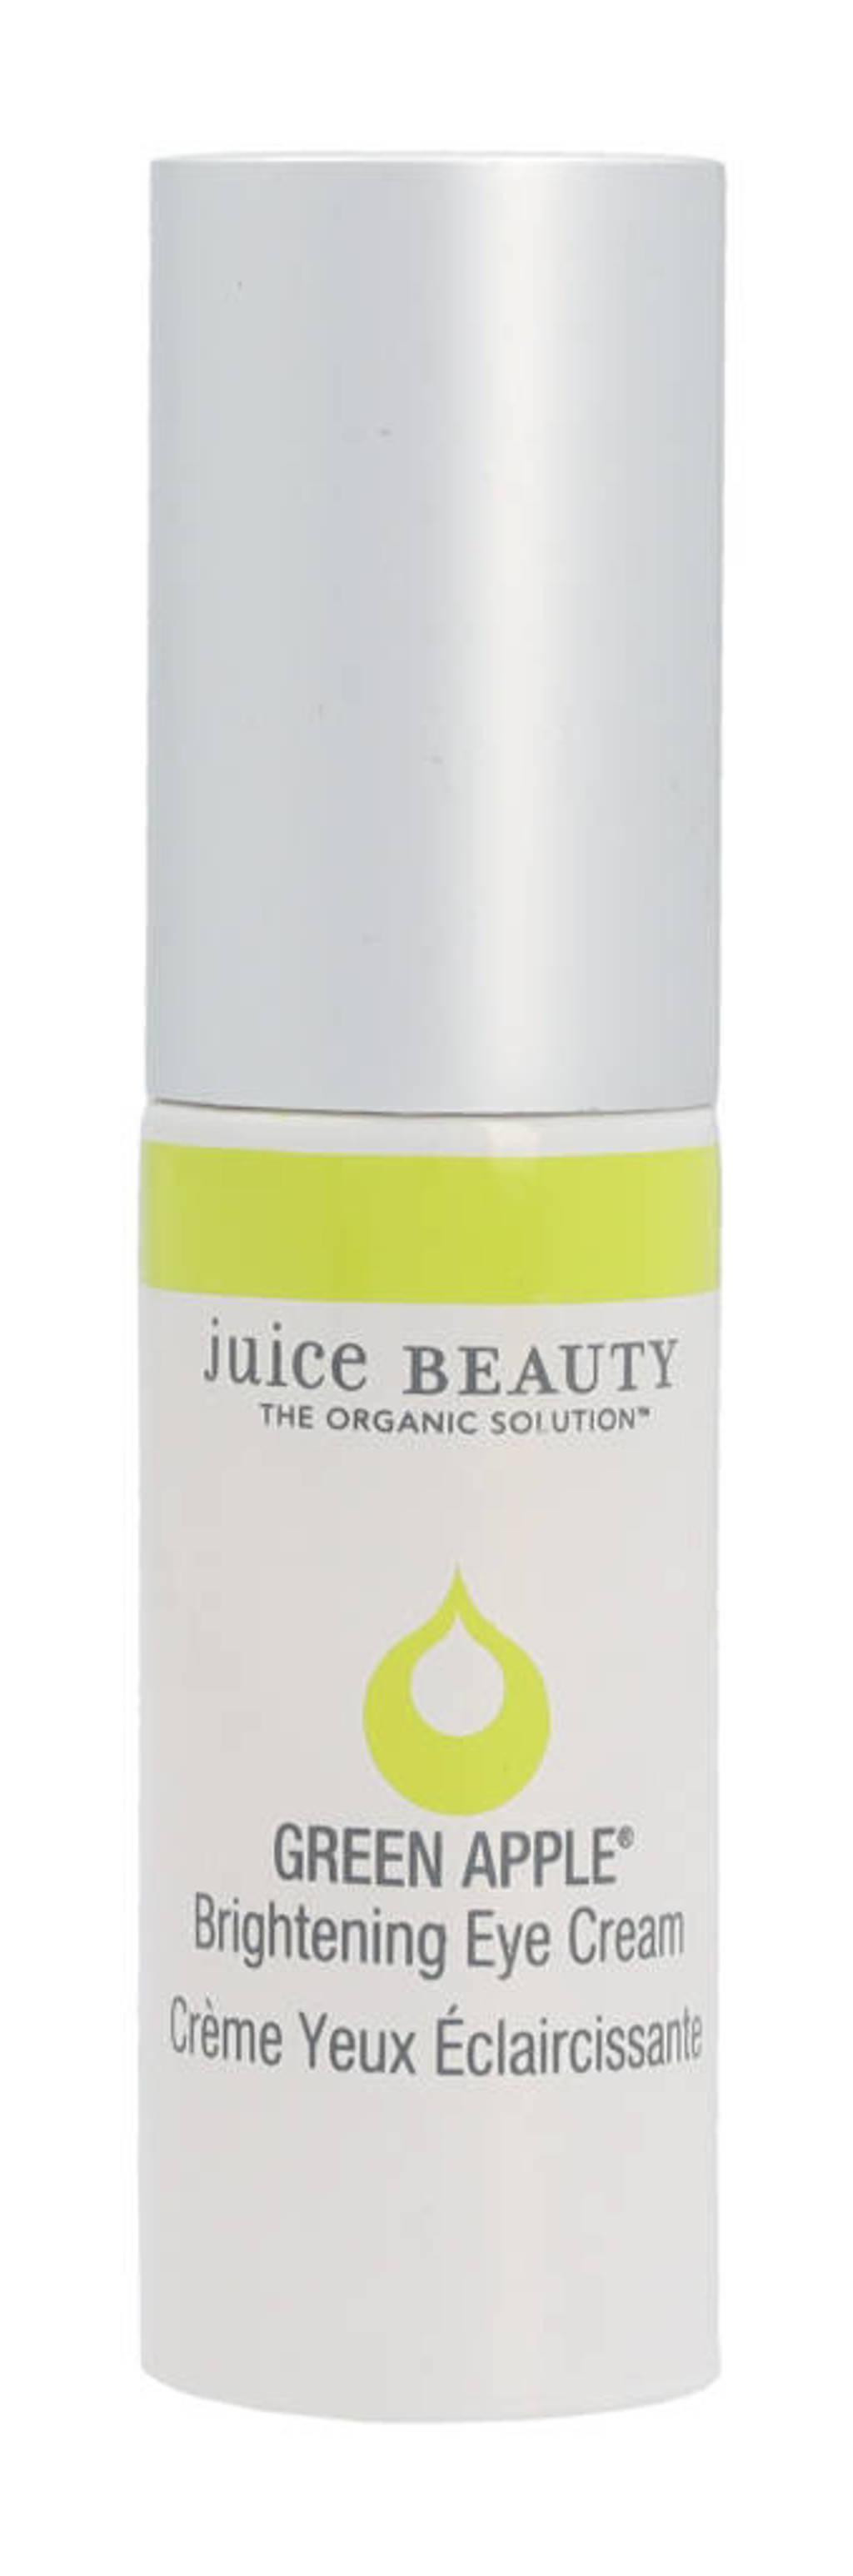 Juice Beauty Green Apple Brightening Eye Cream oogcrème - 15 ml